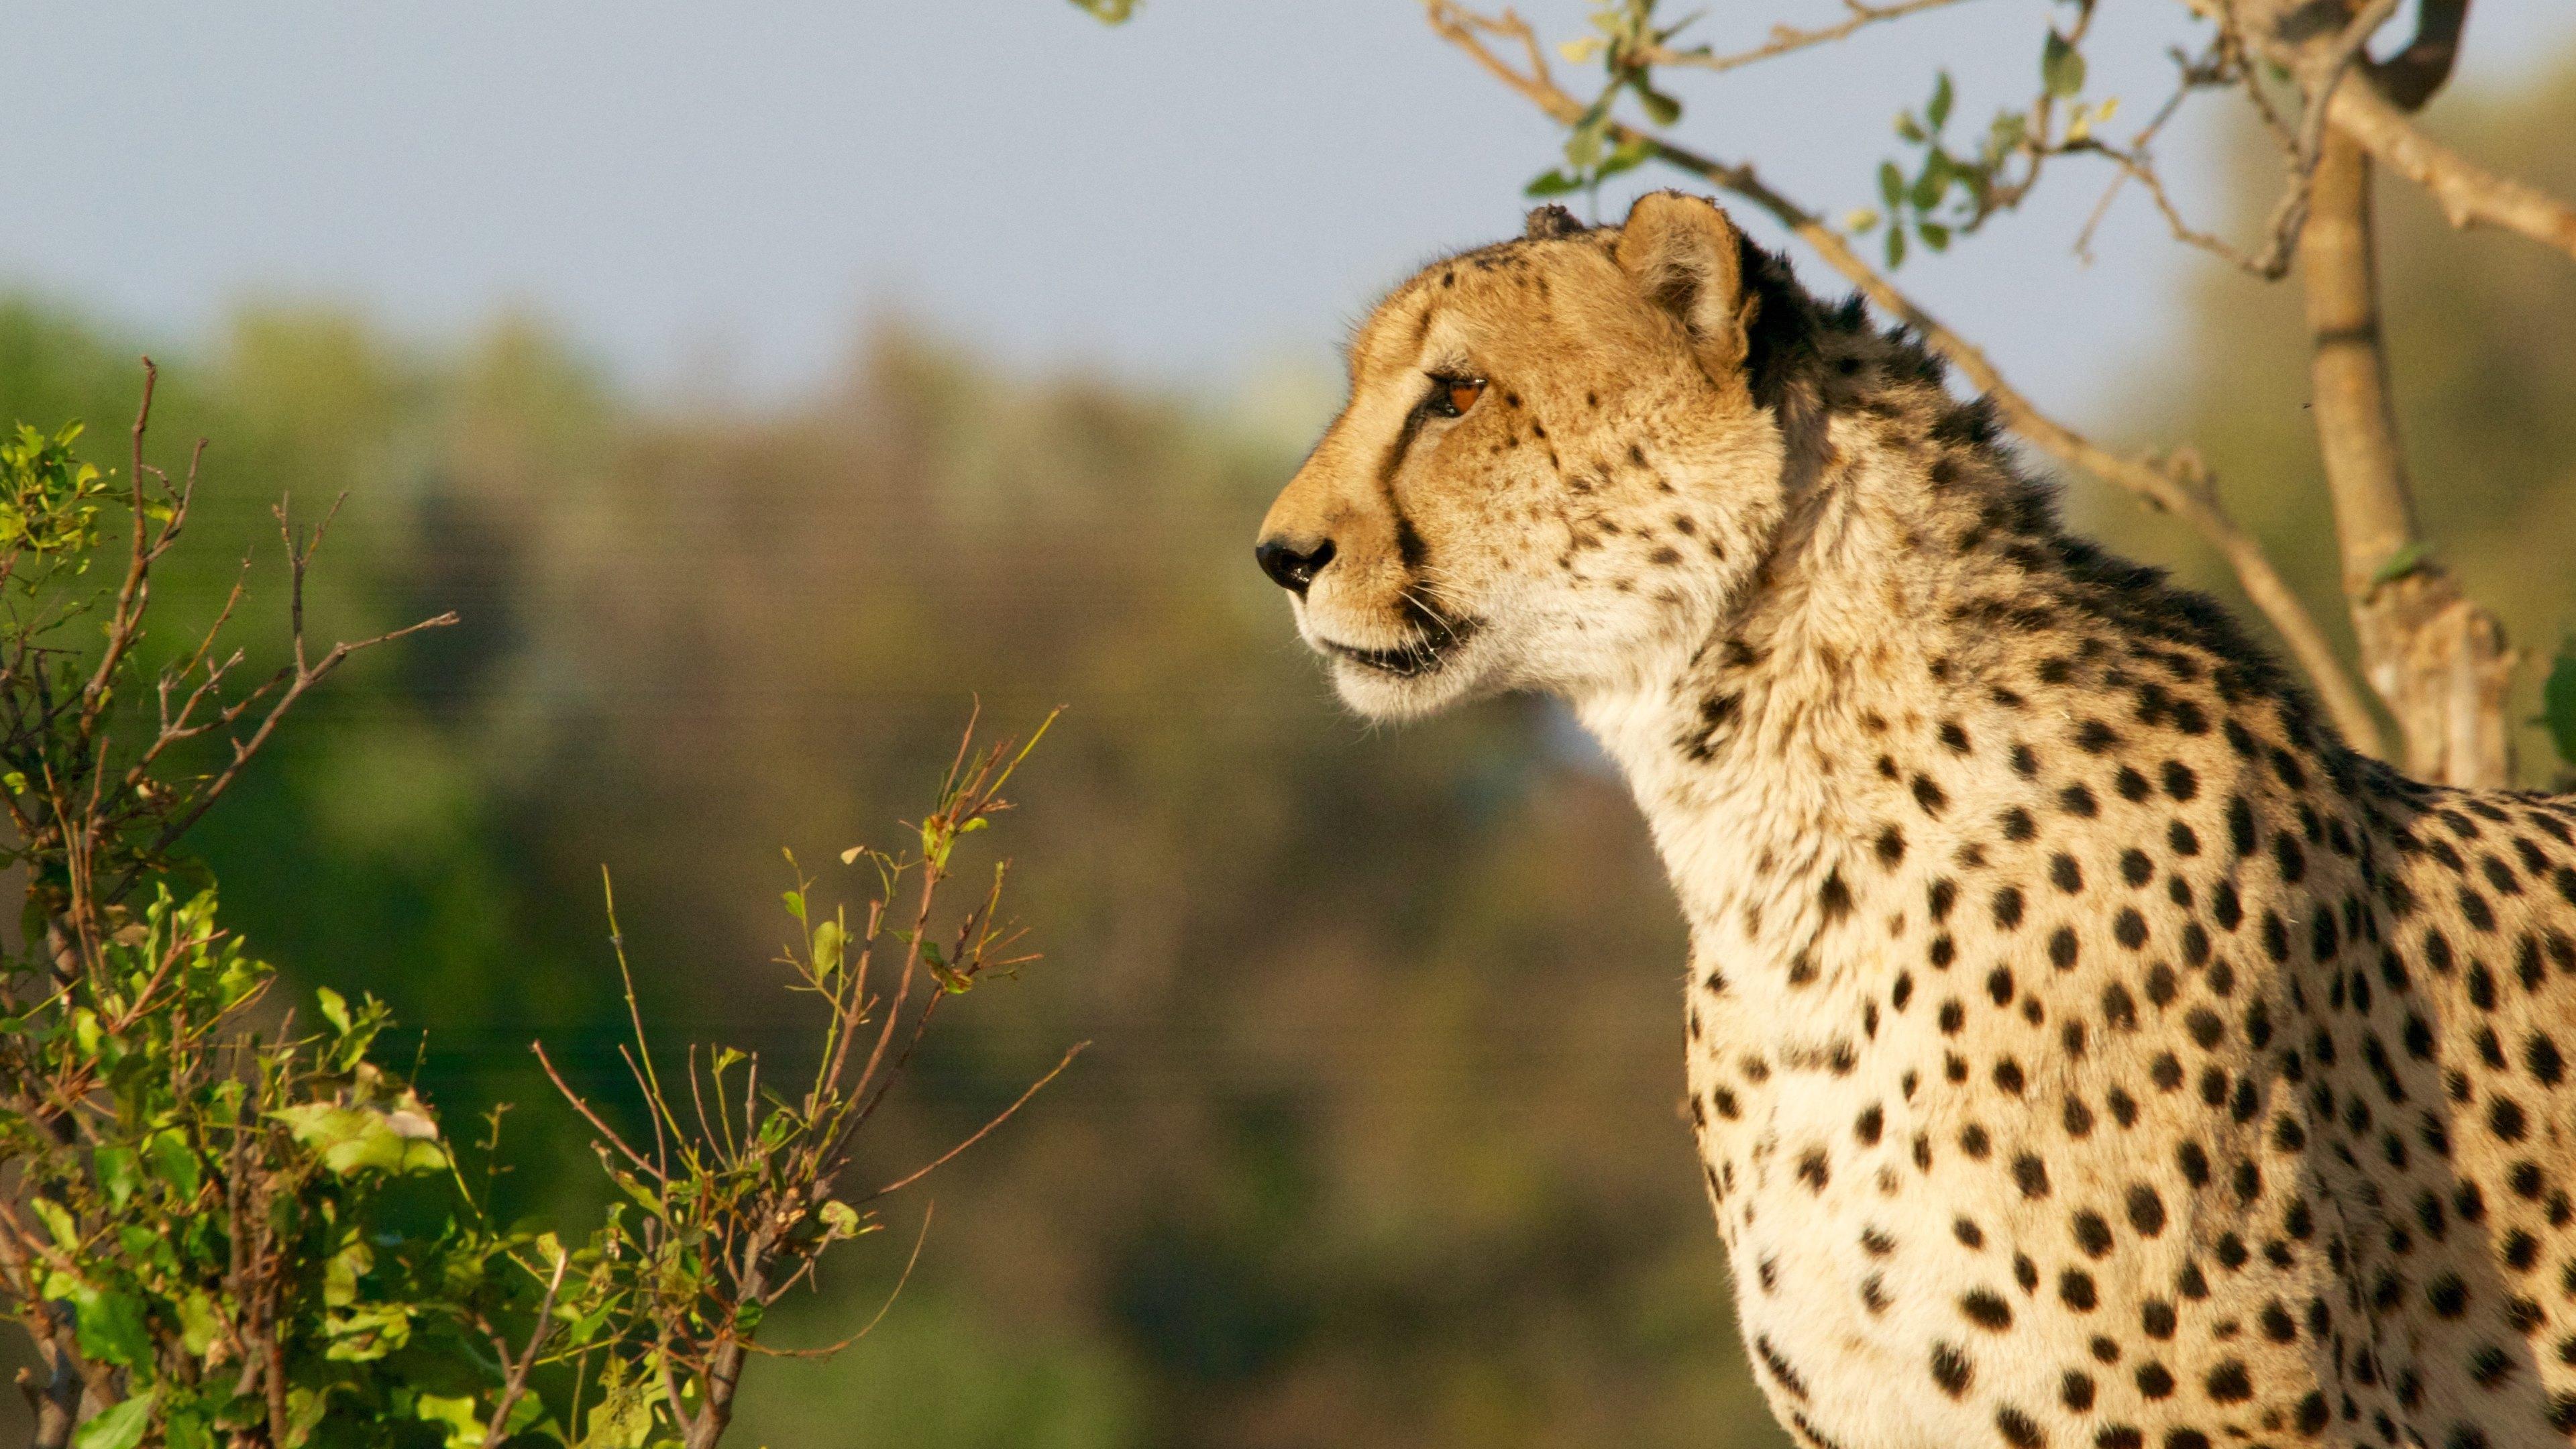 Cheetahs_in_wild_uhd